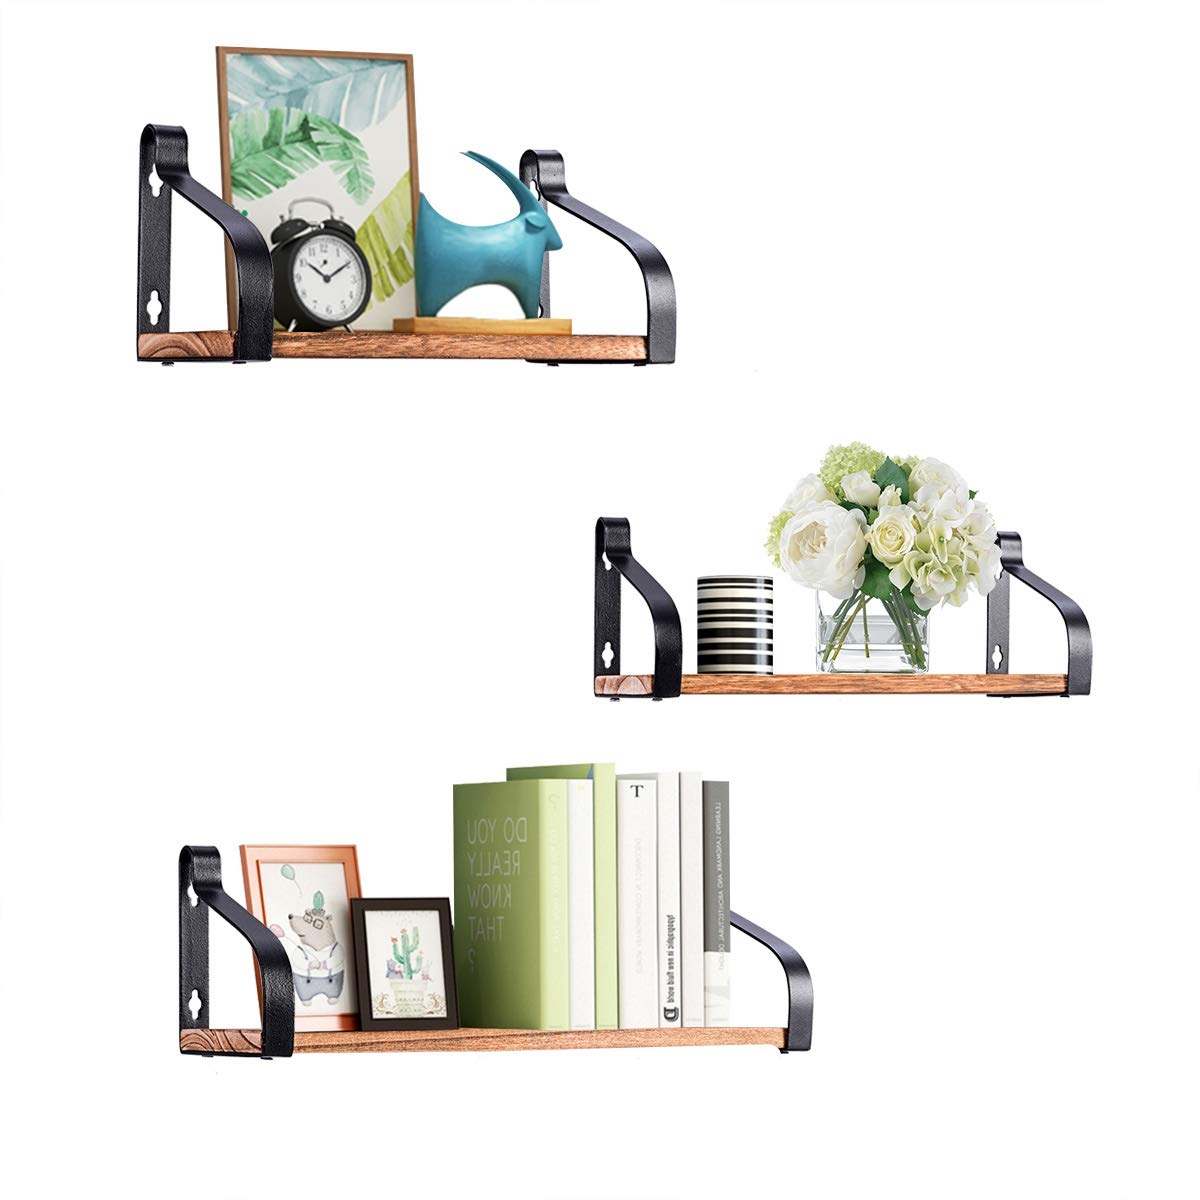 Set of 3 Wall Mount Floating Shelves Rustic Wood Storage Shelves